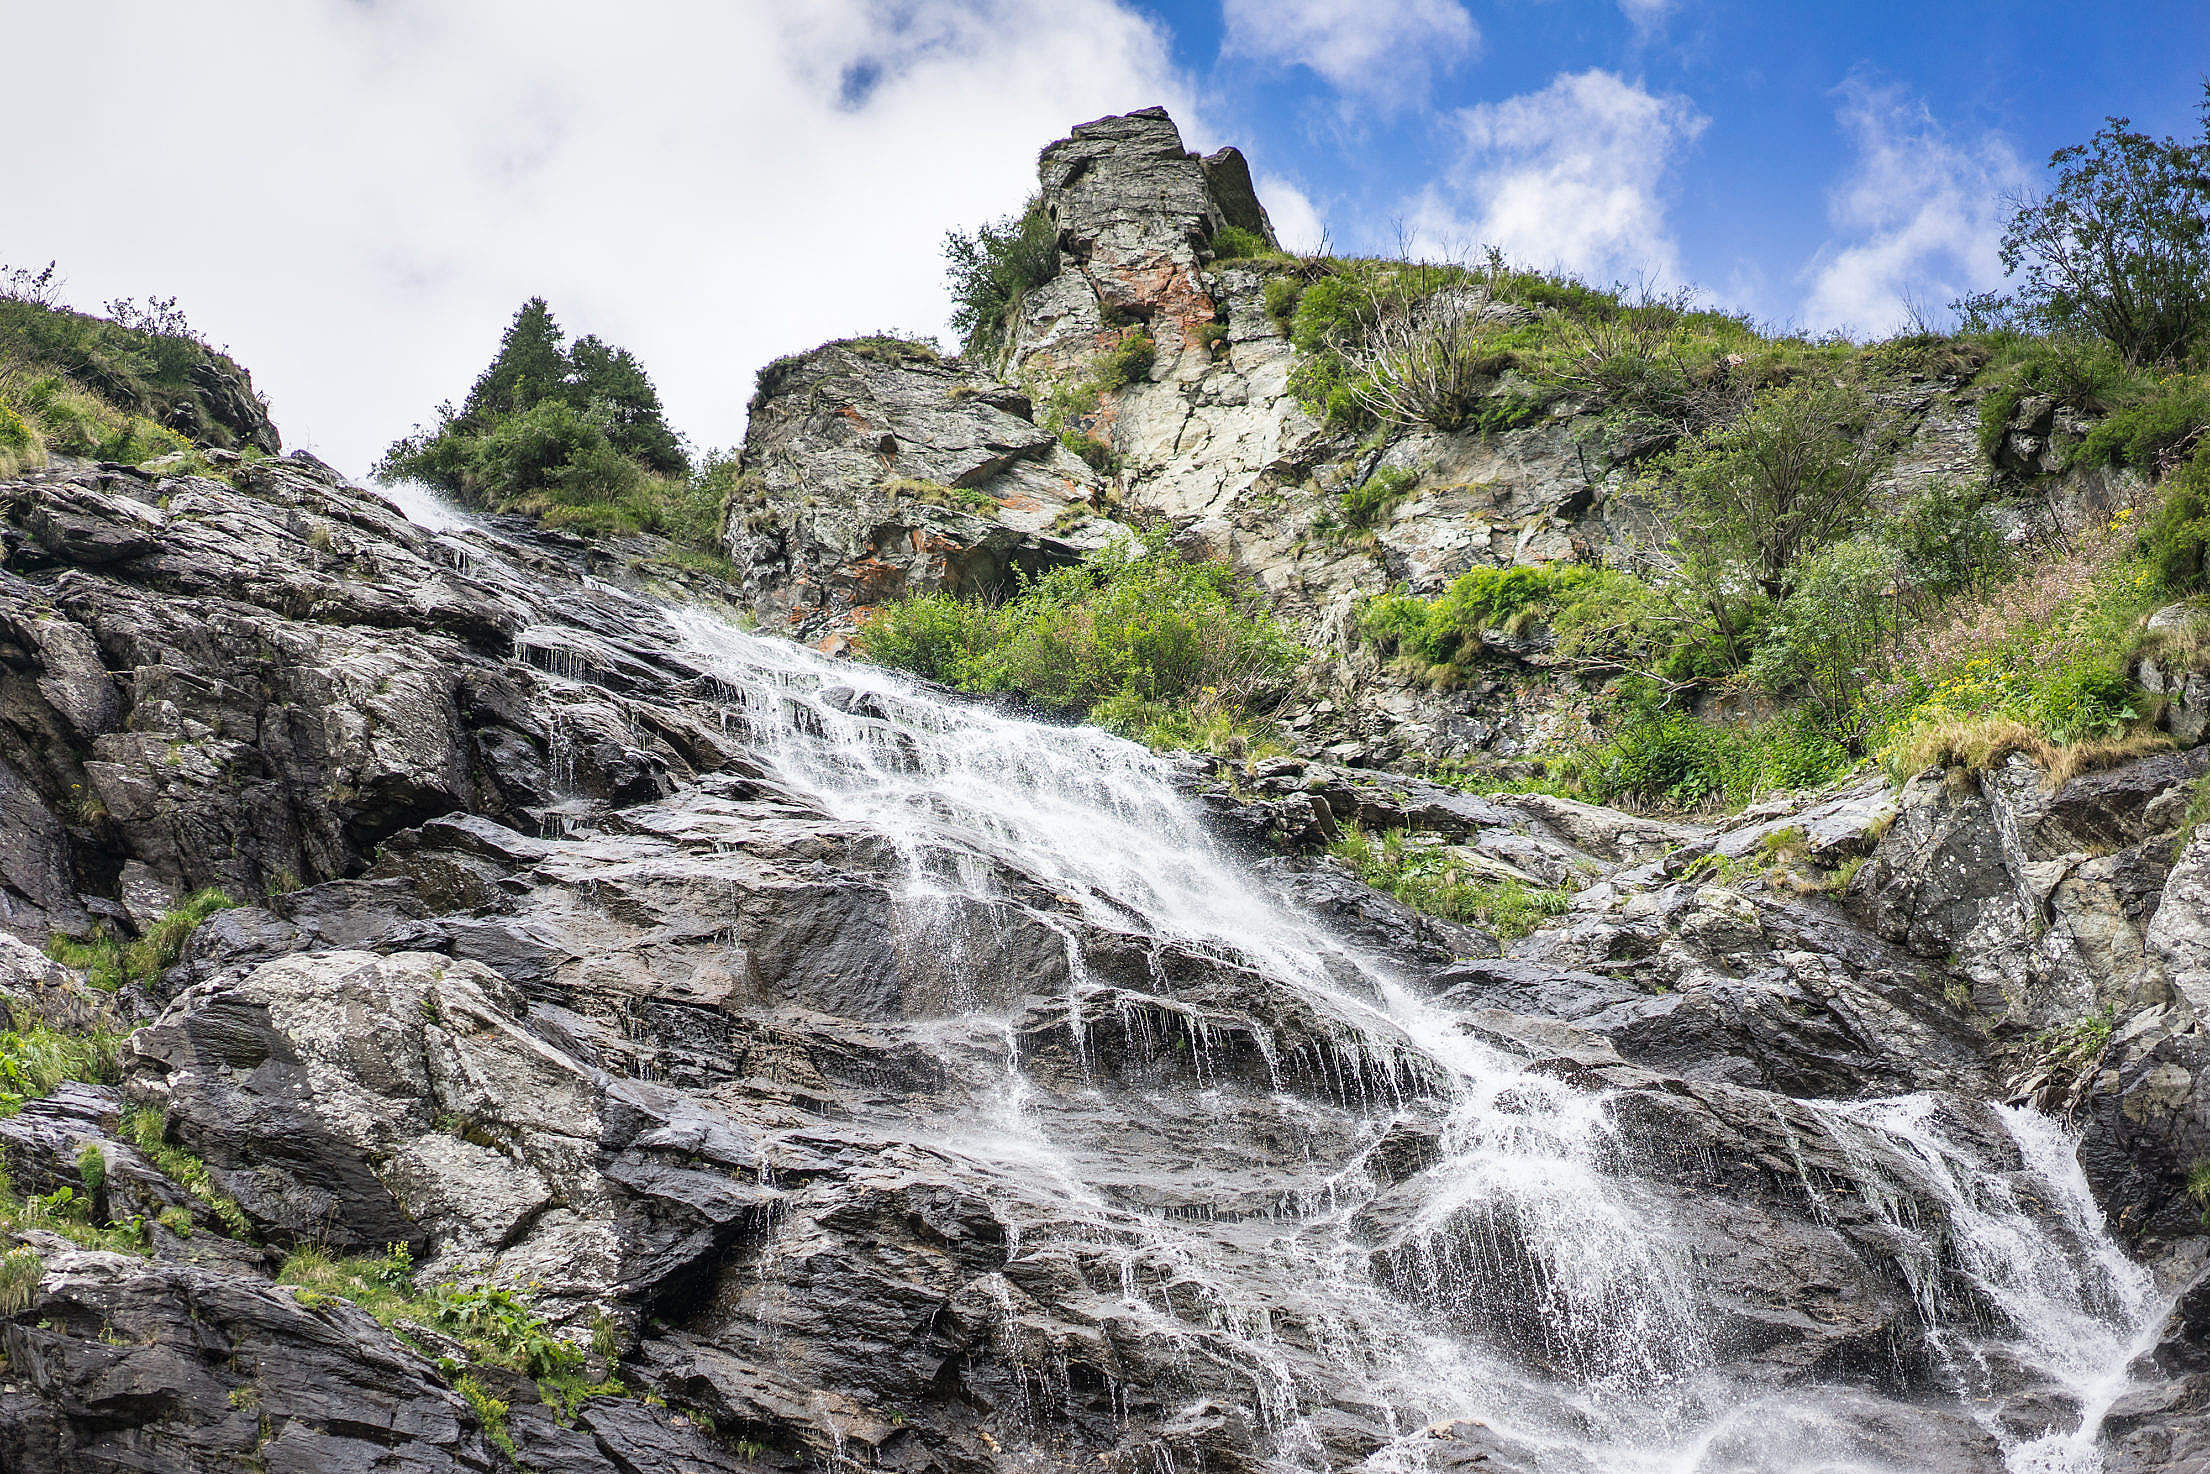 Amazing Waterfalls in Pure Romanian Nature Free Stock Photo